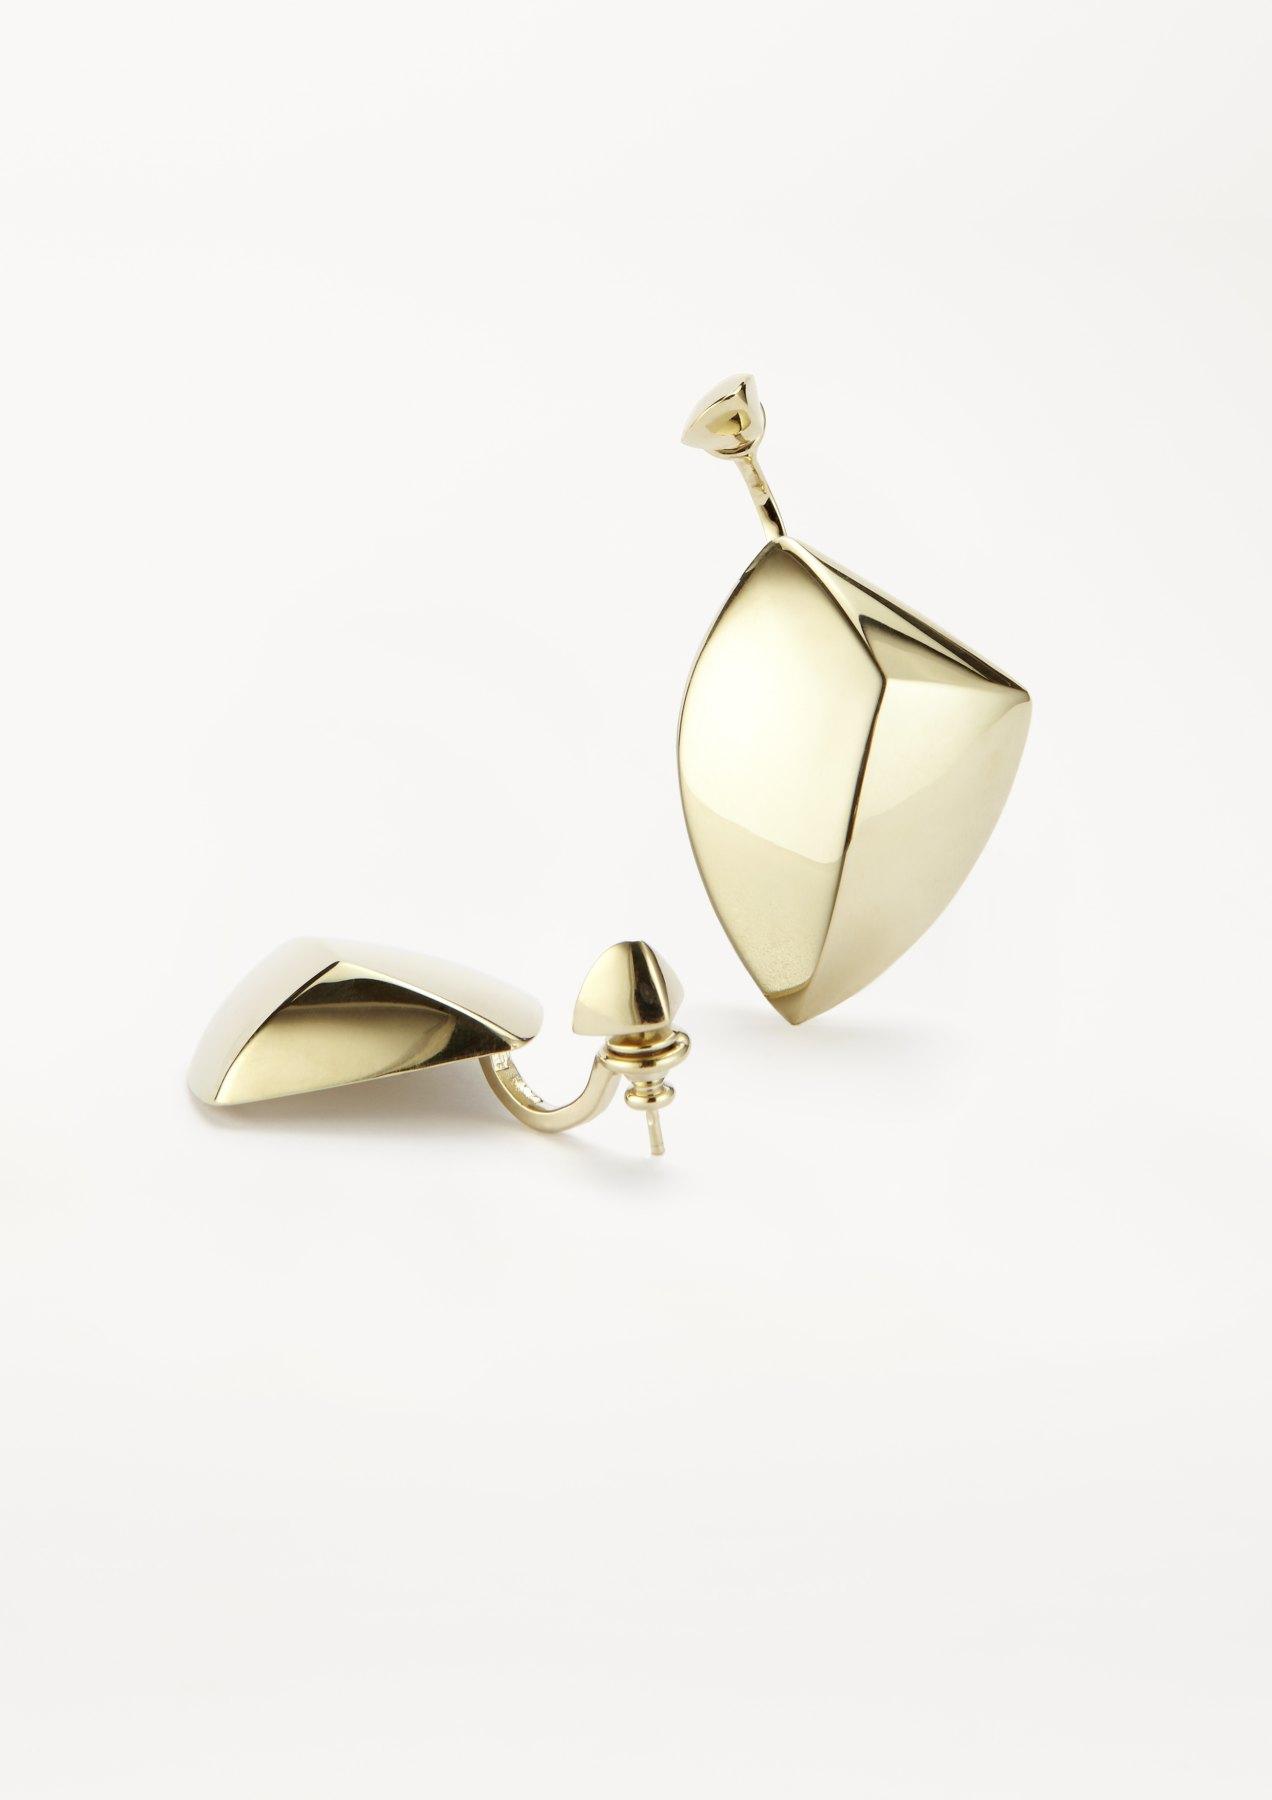 xenia bous jewellery golden stone Big Flying Stone 02 Earring gold